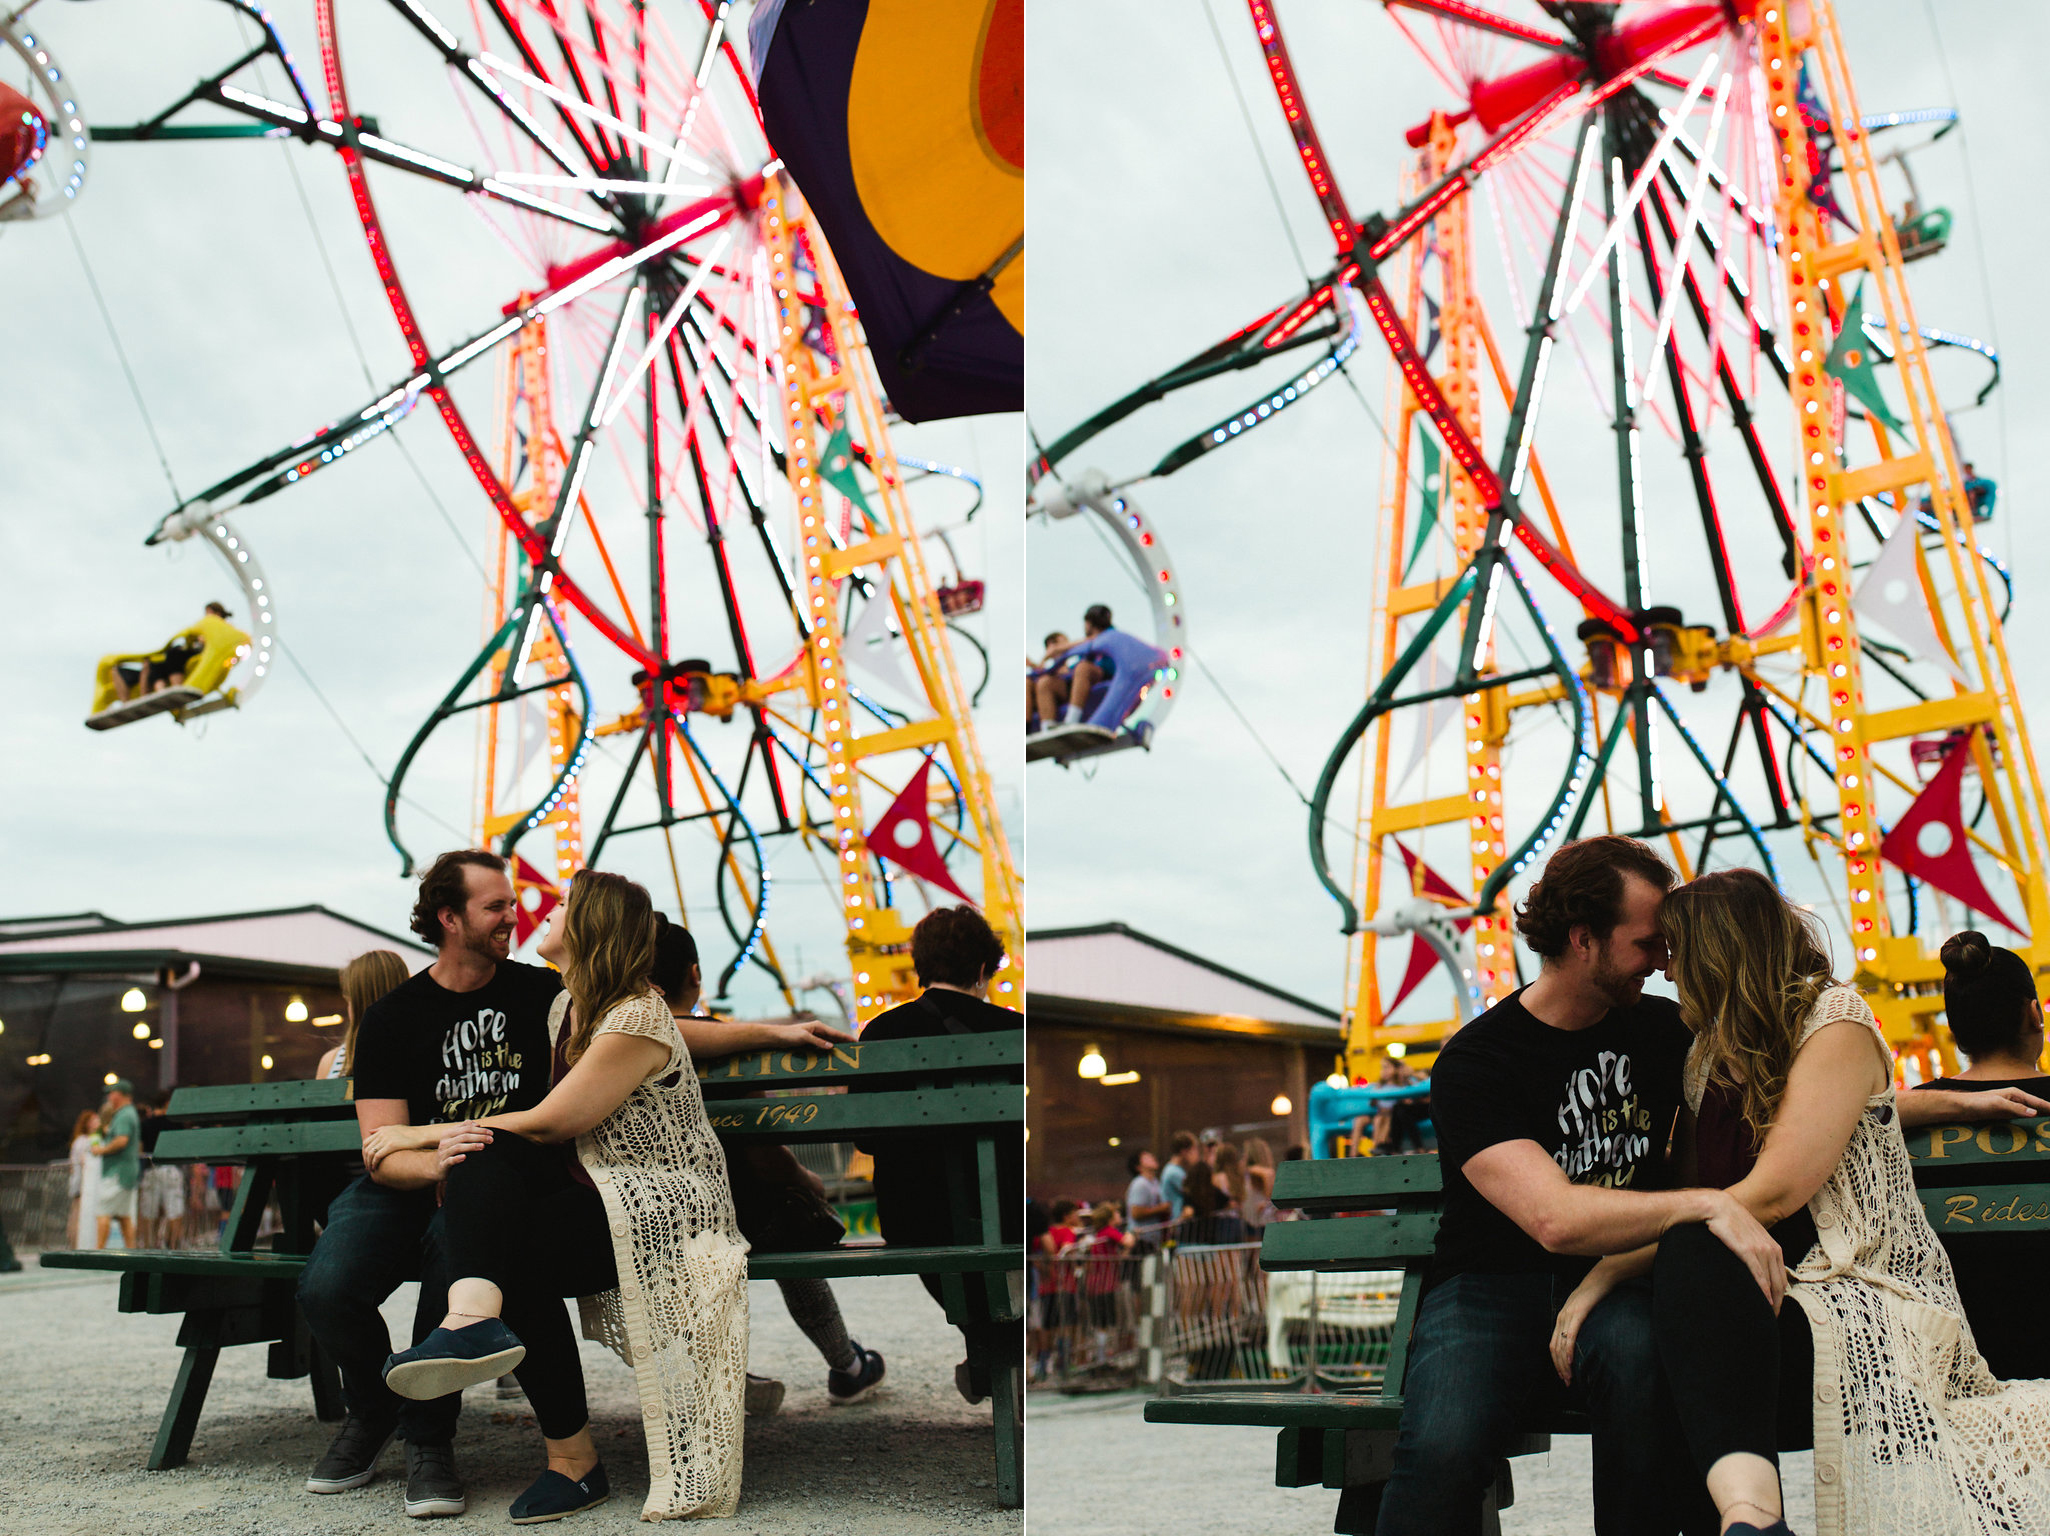 Williamson-County-Fair-Franklin-Tennessee-Couples-21